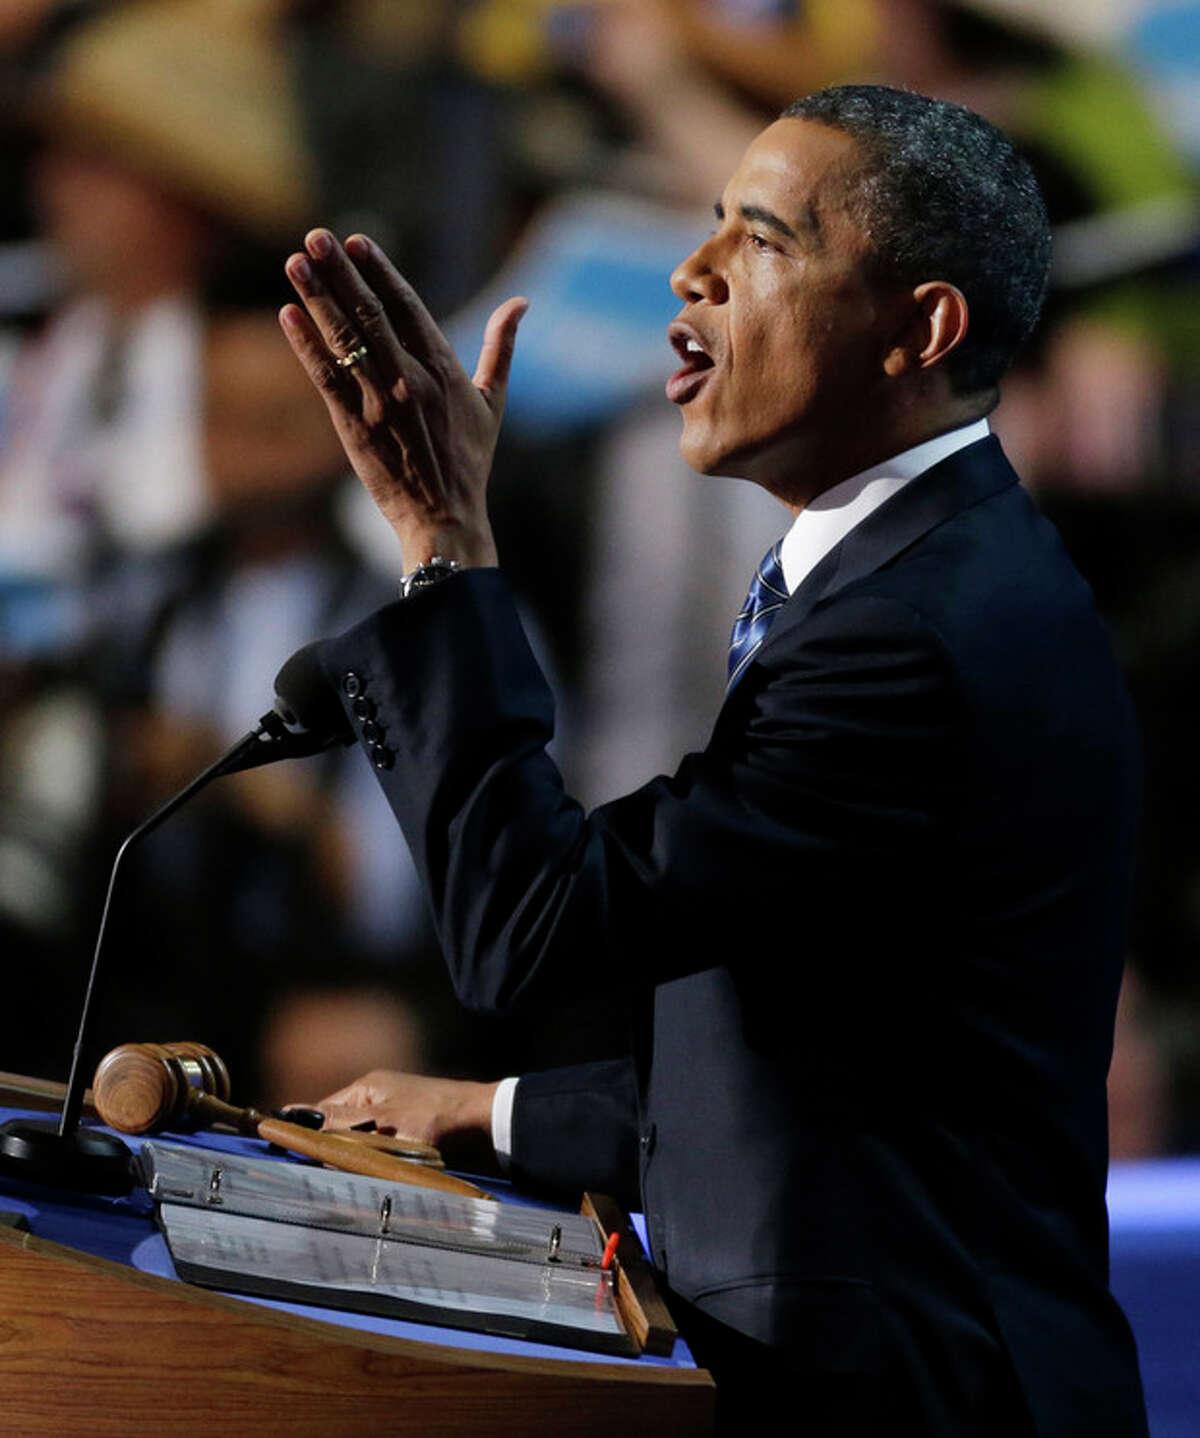 President Barack Obama speaks to delegates at the Democratic National Convention in Charlotte, N.C., on Thursday, Sept. 6, 2012. (AP Photo/Lynne Sladky)